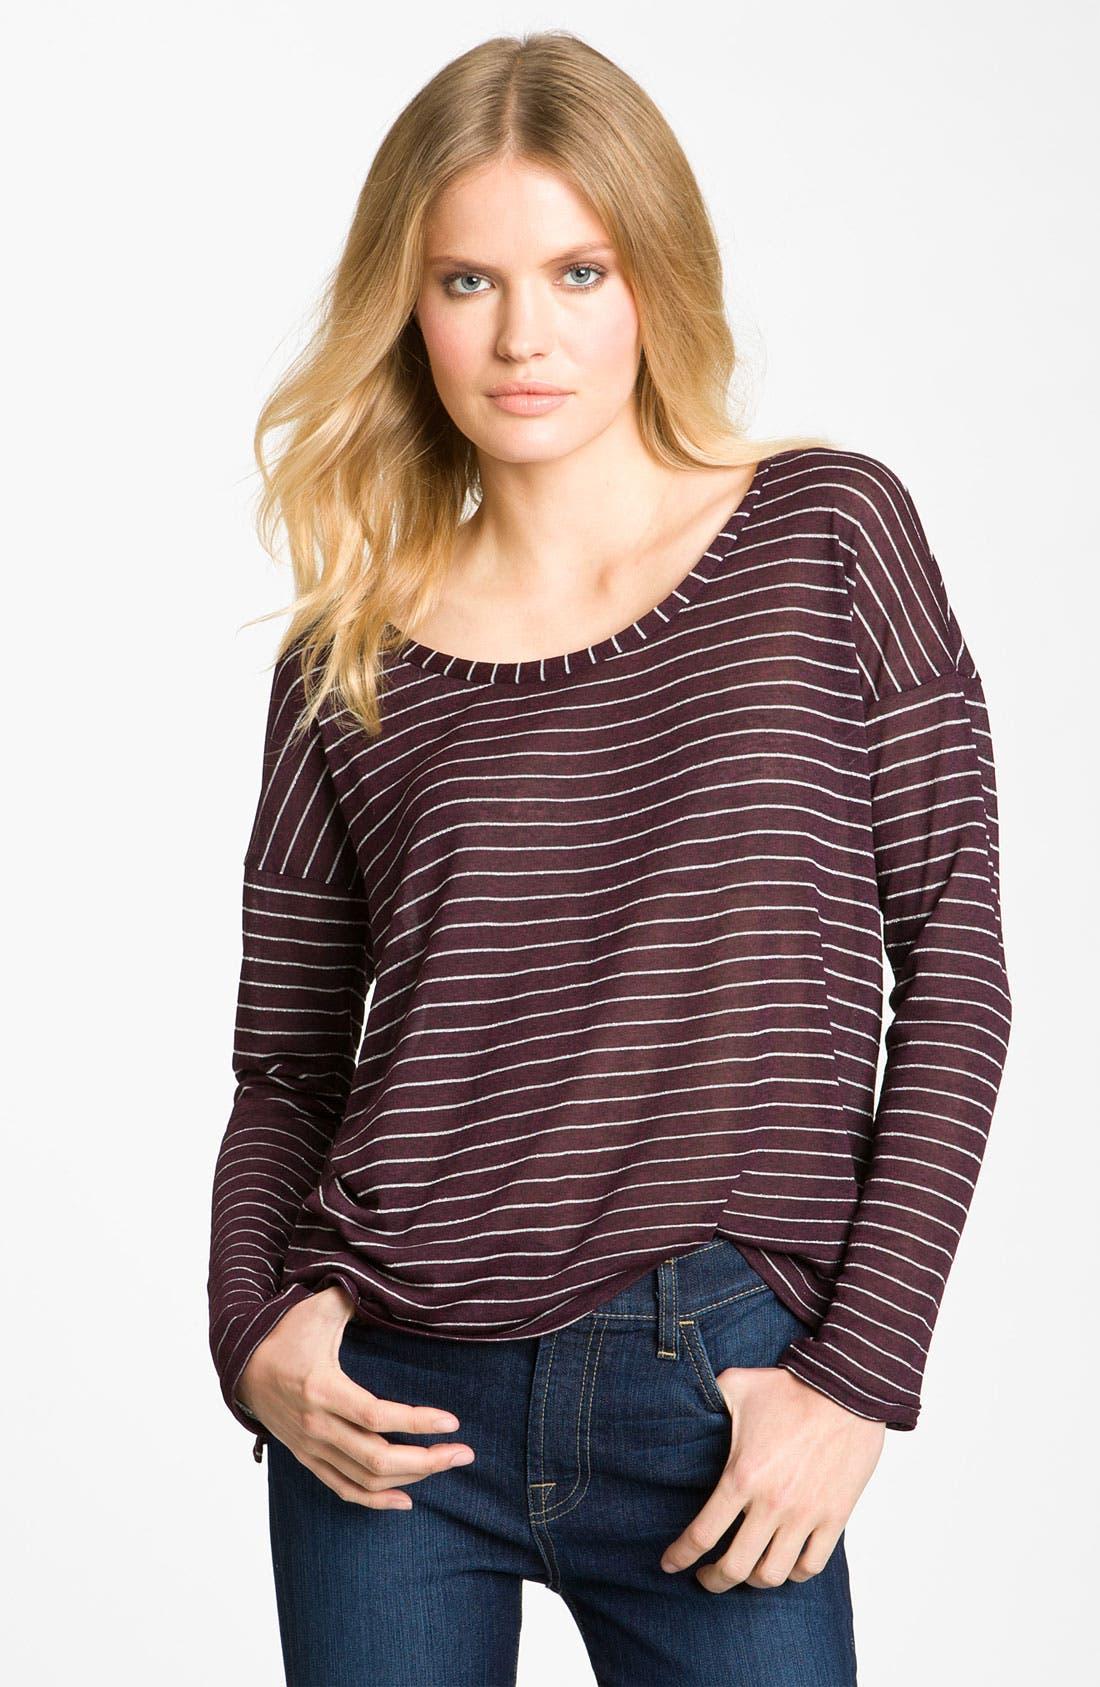 Alternate Image 1 Selected - Splendid Lurex® Stripe Top (Nordstrom Exclusive)